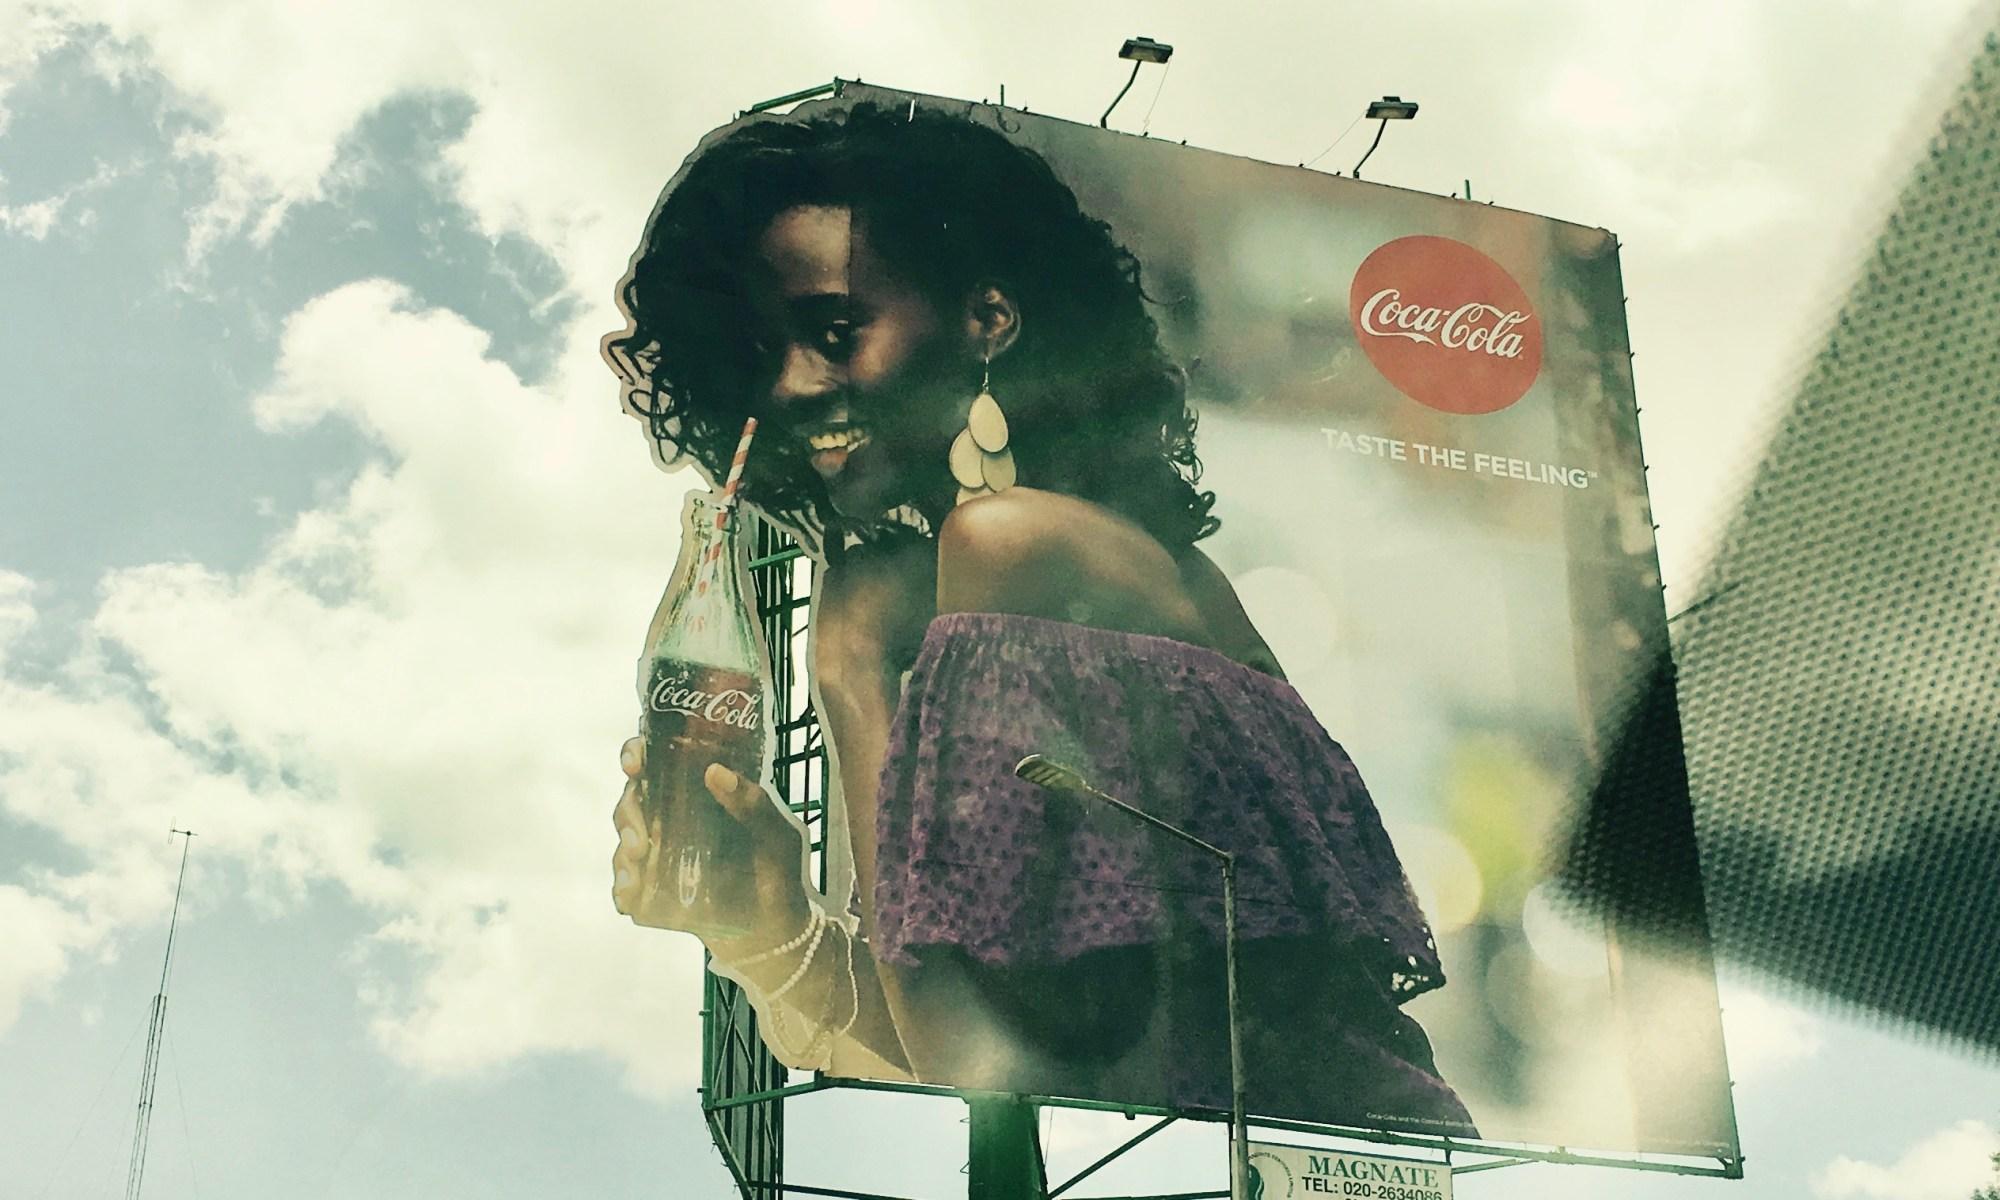 Nairobi advertising